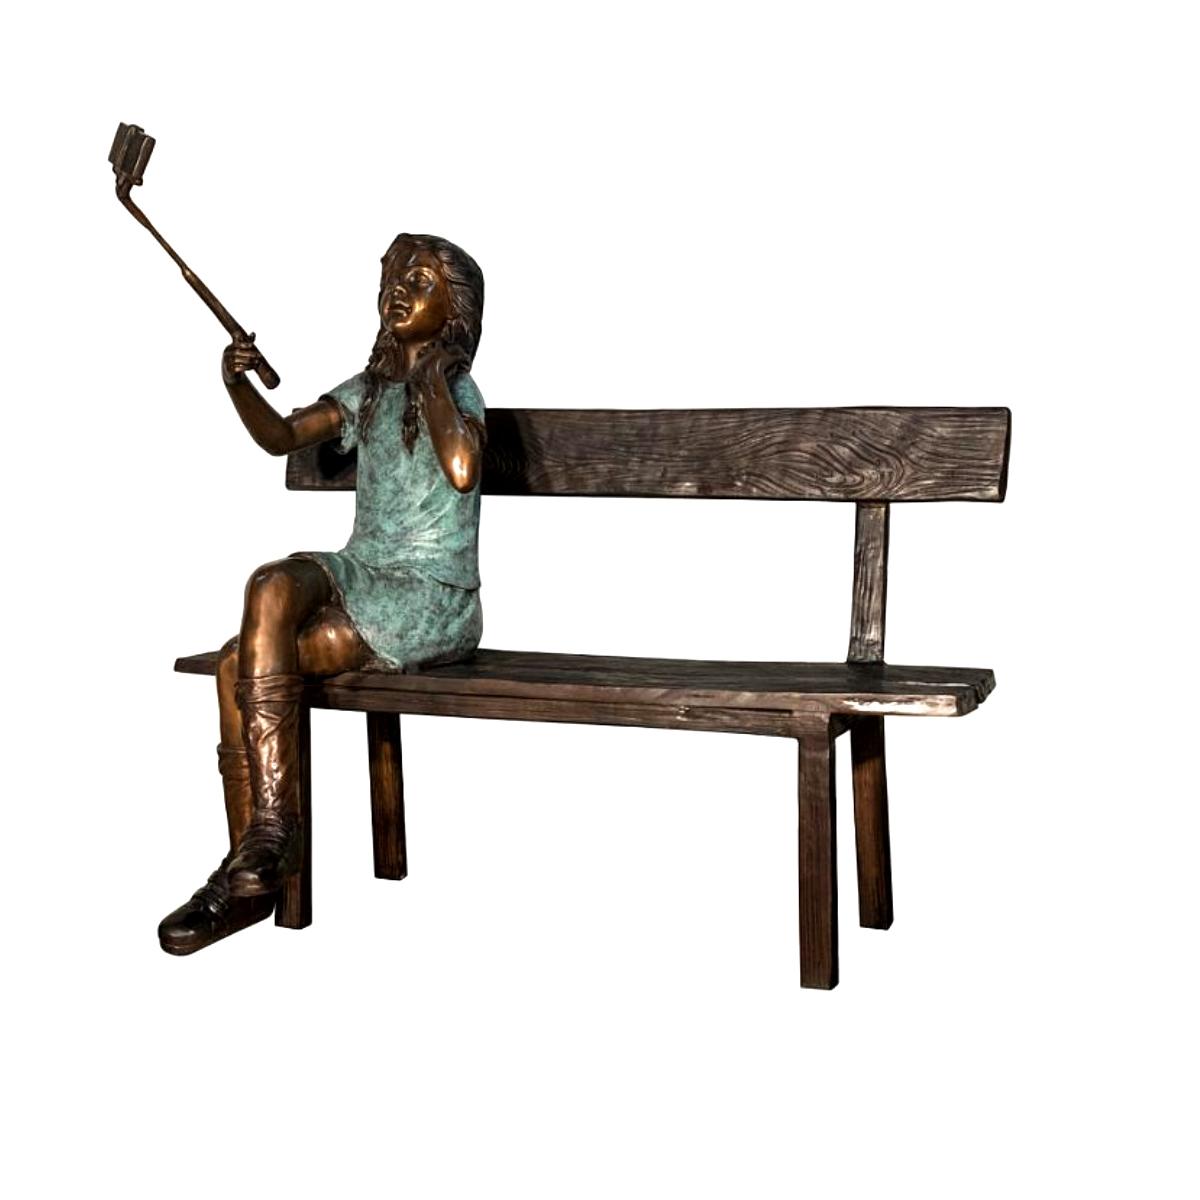 SRB058764 Bronze Girl on Bench Sculpture Metropolitan Galleries Inc.